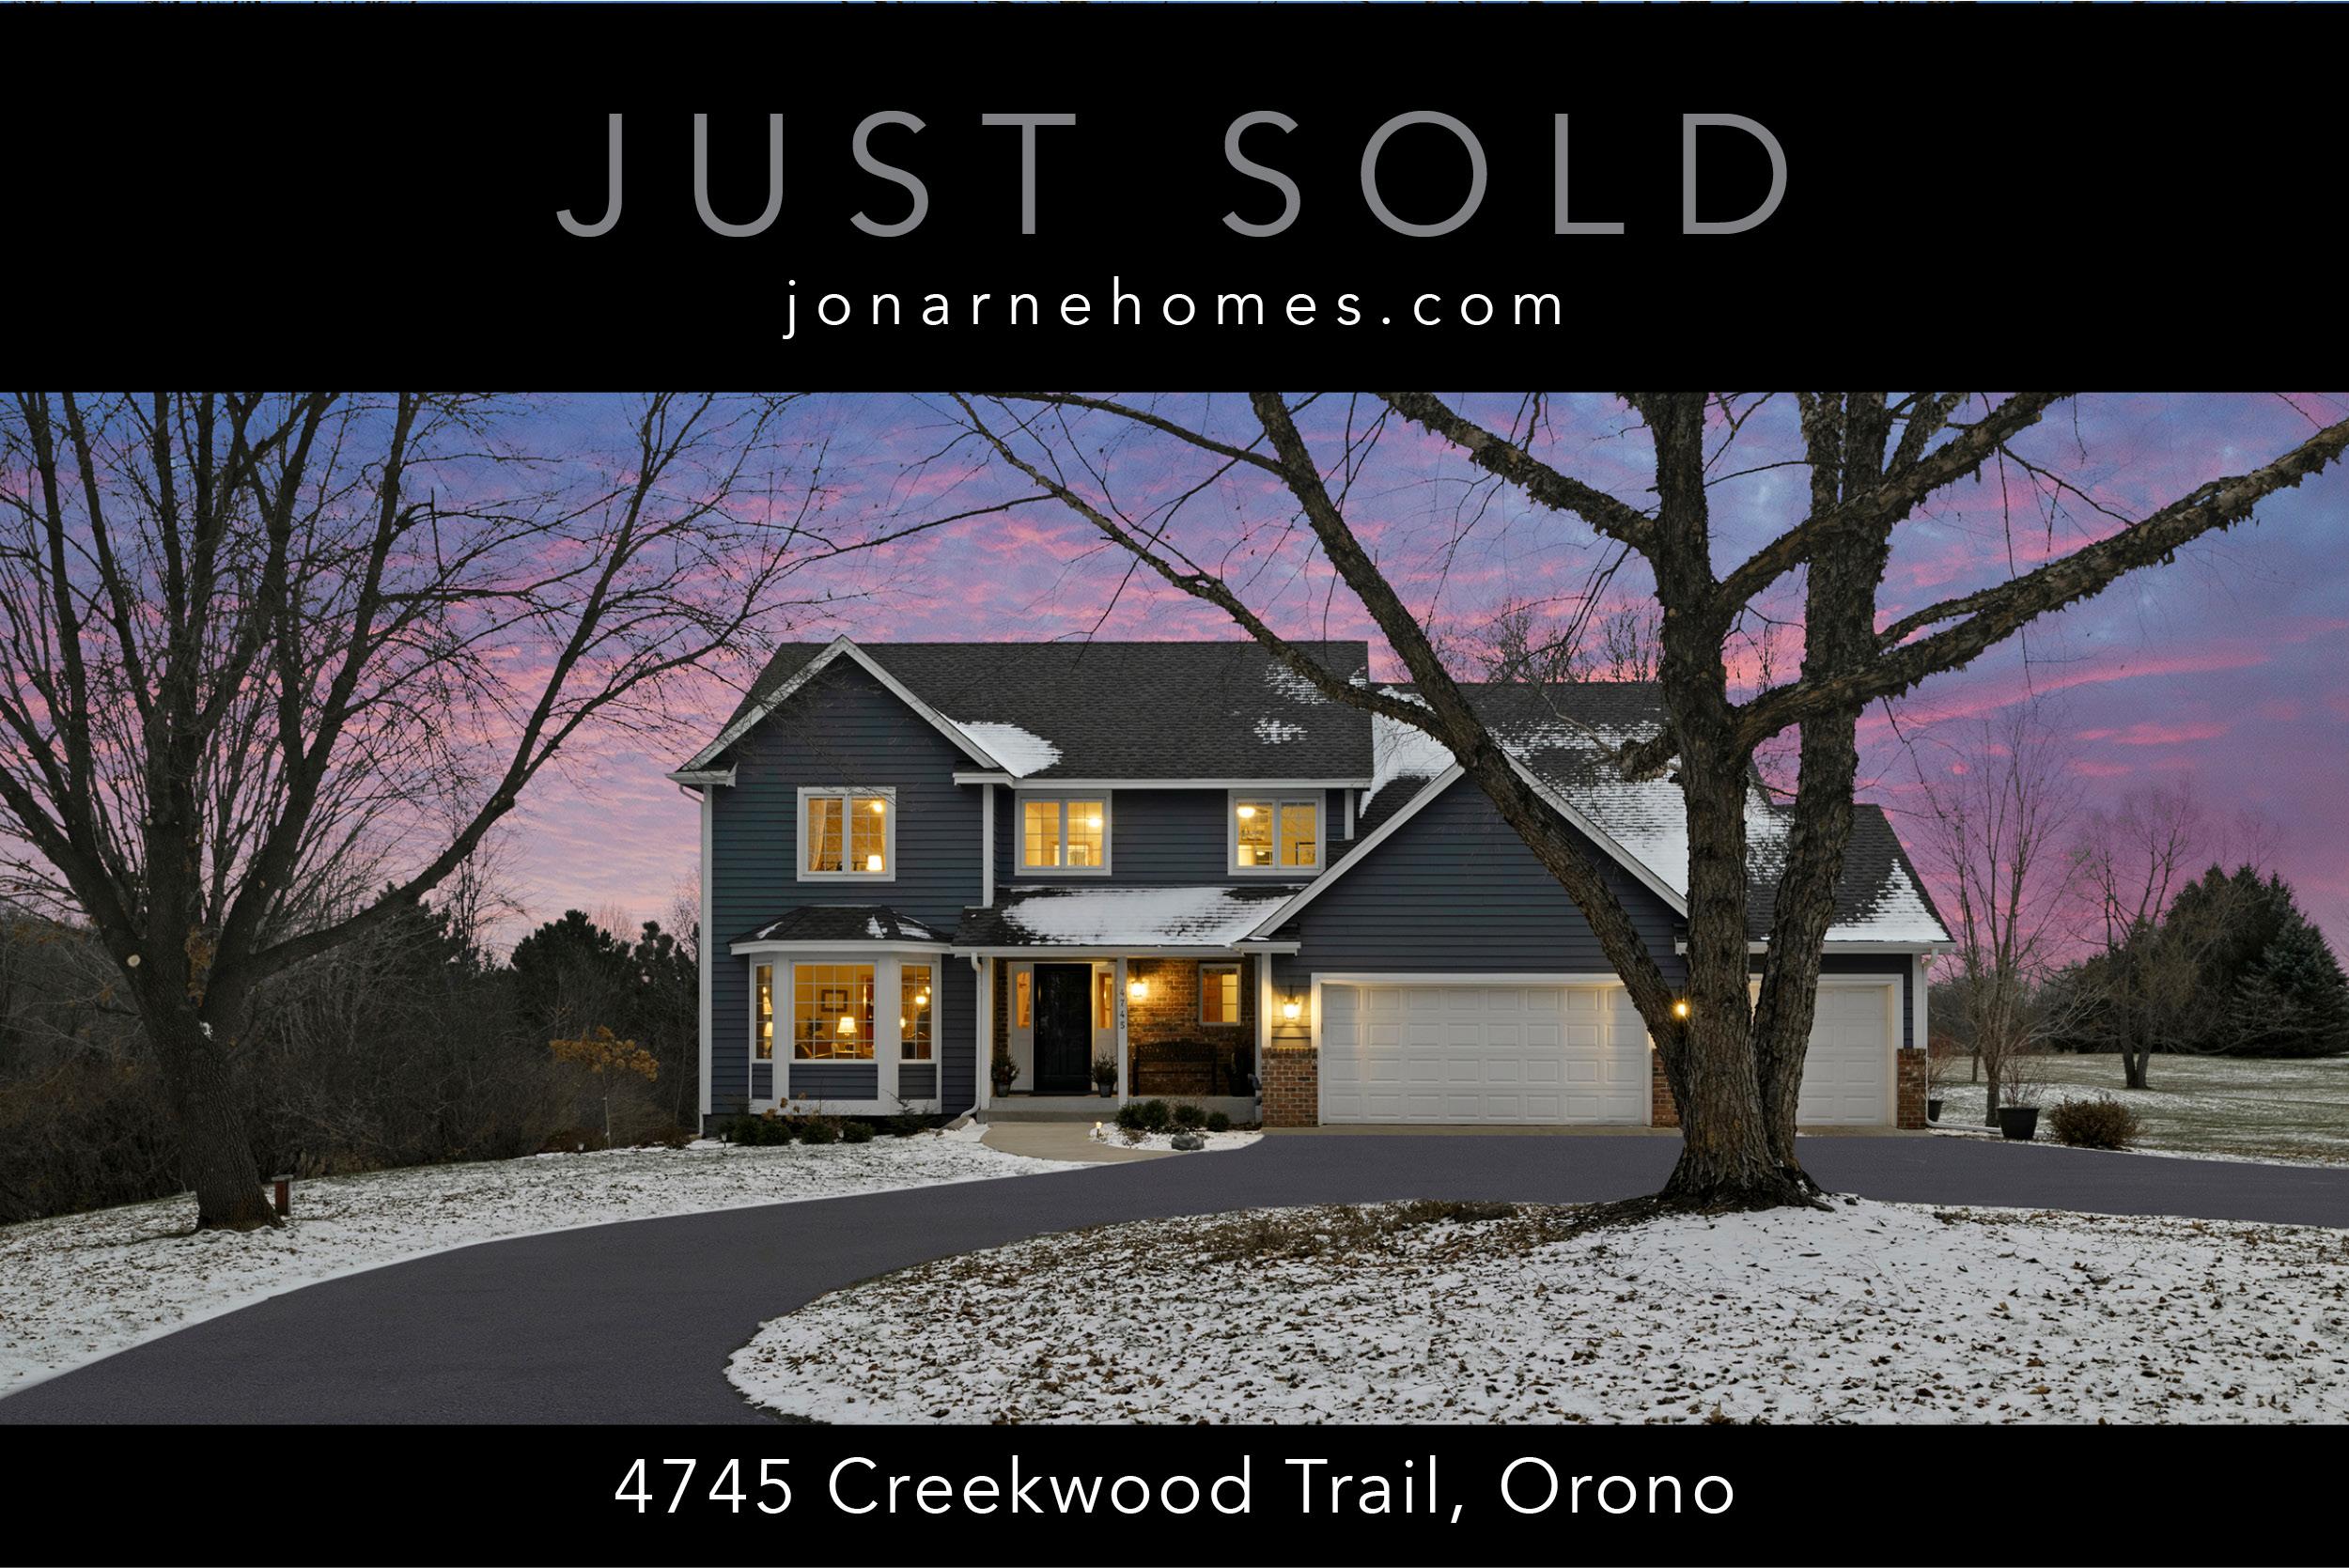 4745 Creekwood Trail, Orono